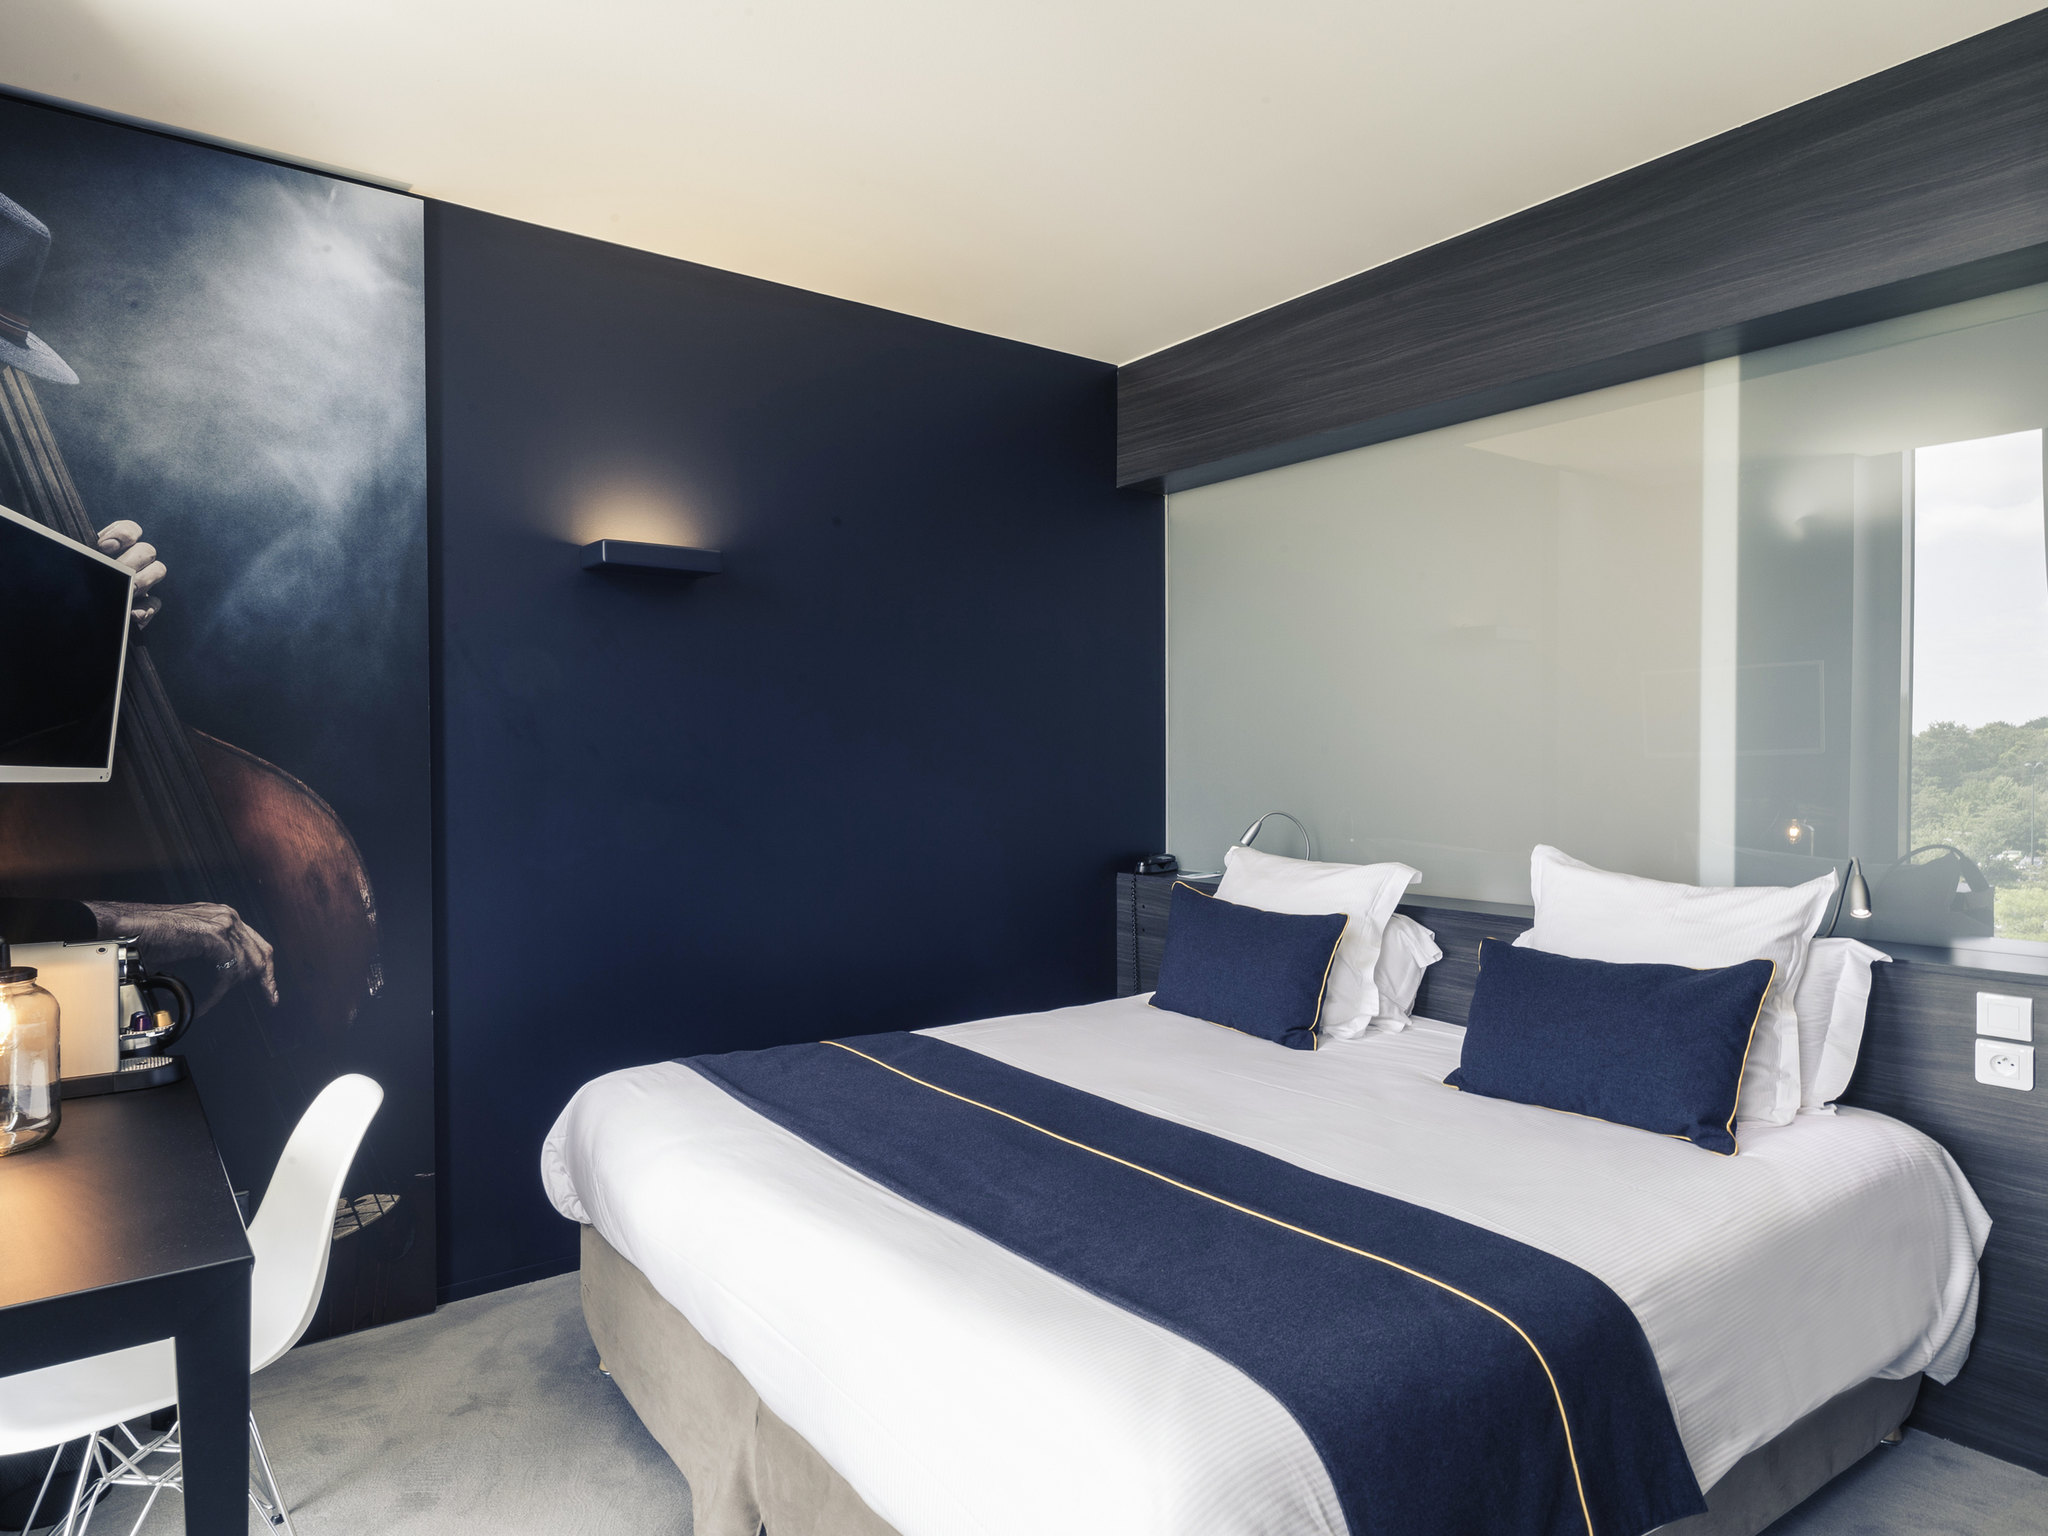 فندق - Hôtel Mercure Zénith Nantes Saint-Herblain